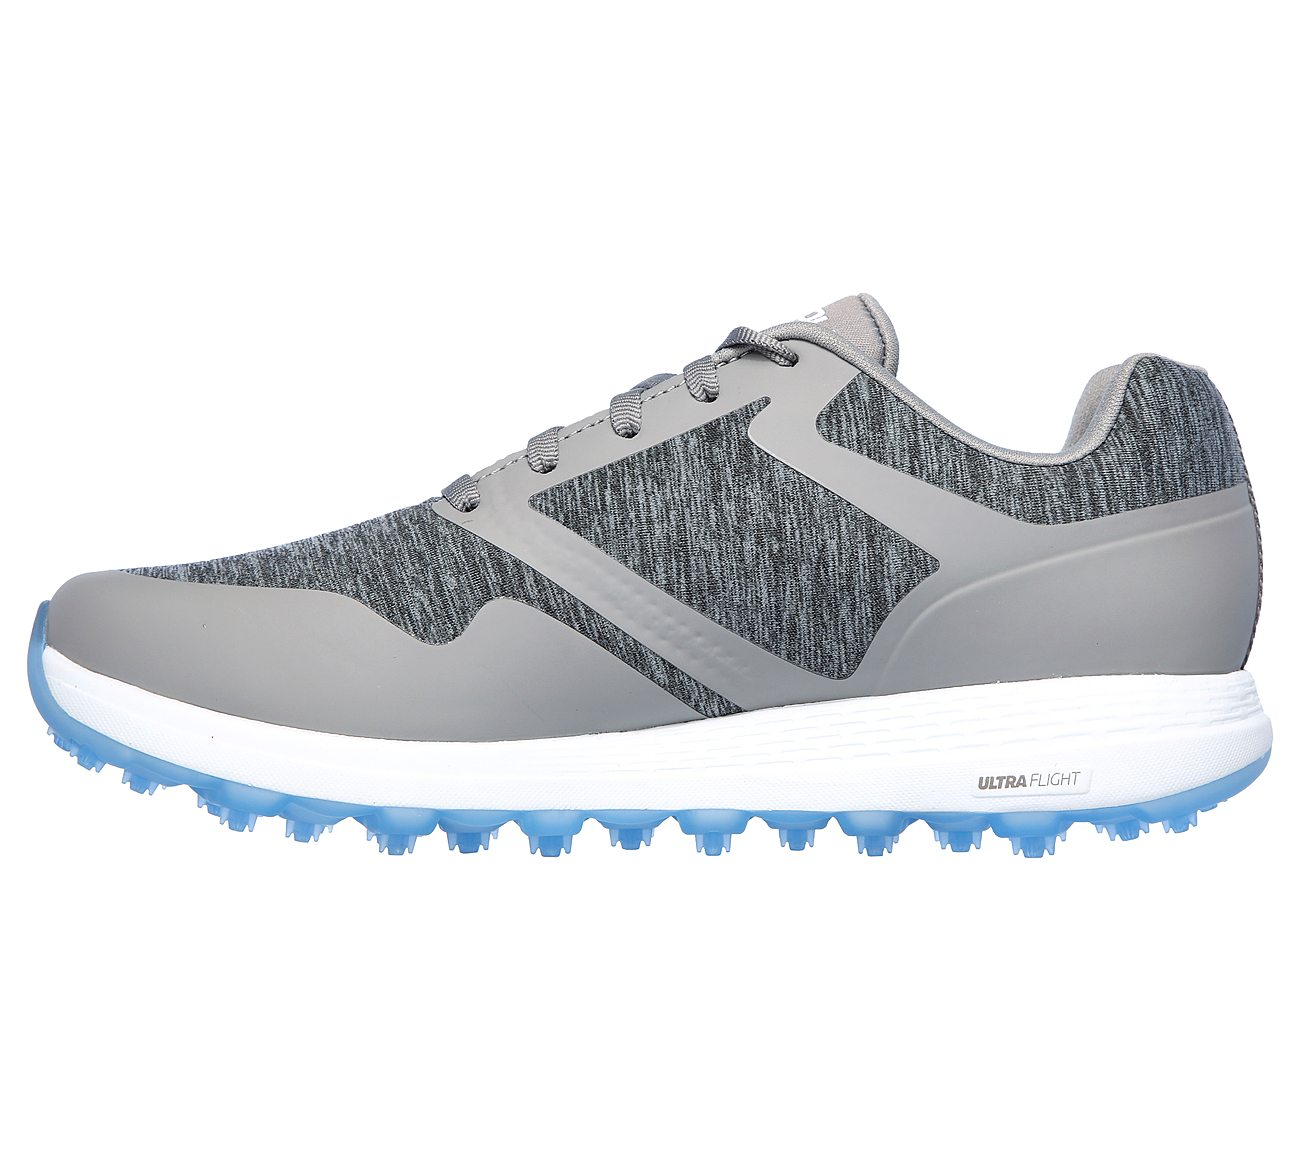 874792db3 Buy SKECHERS Skechers GO GOLF Max - Cut Skechers GO GOLF Shoes only ...